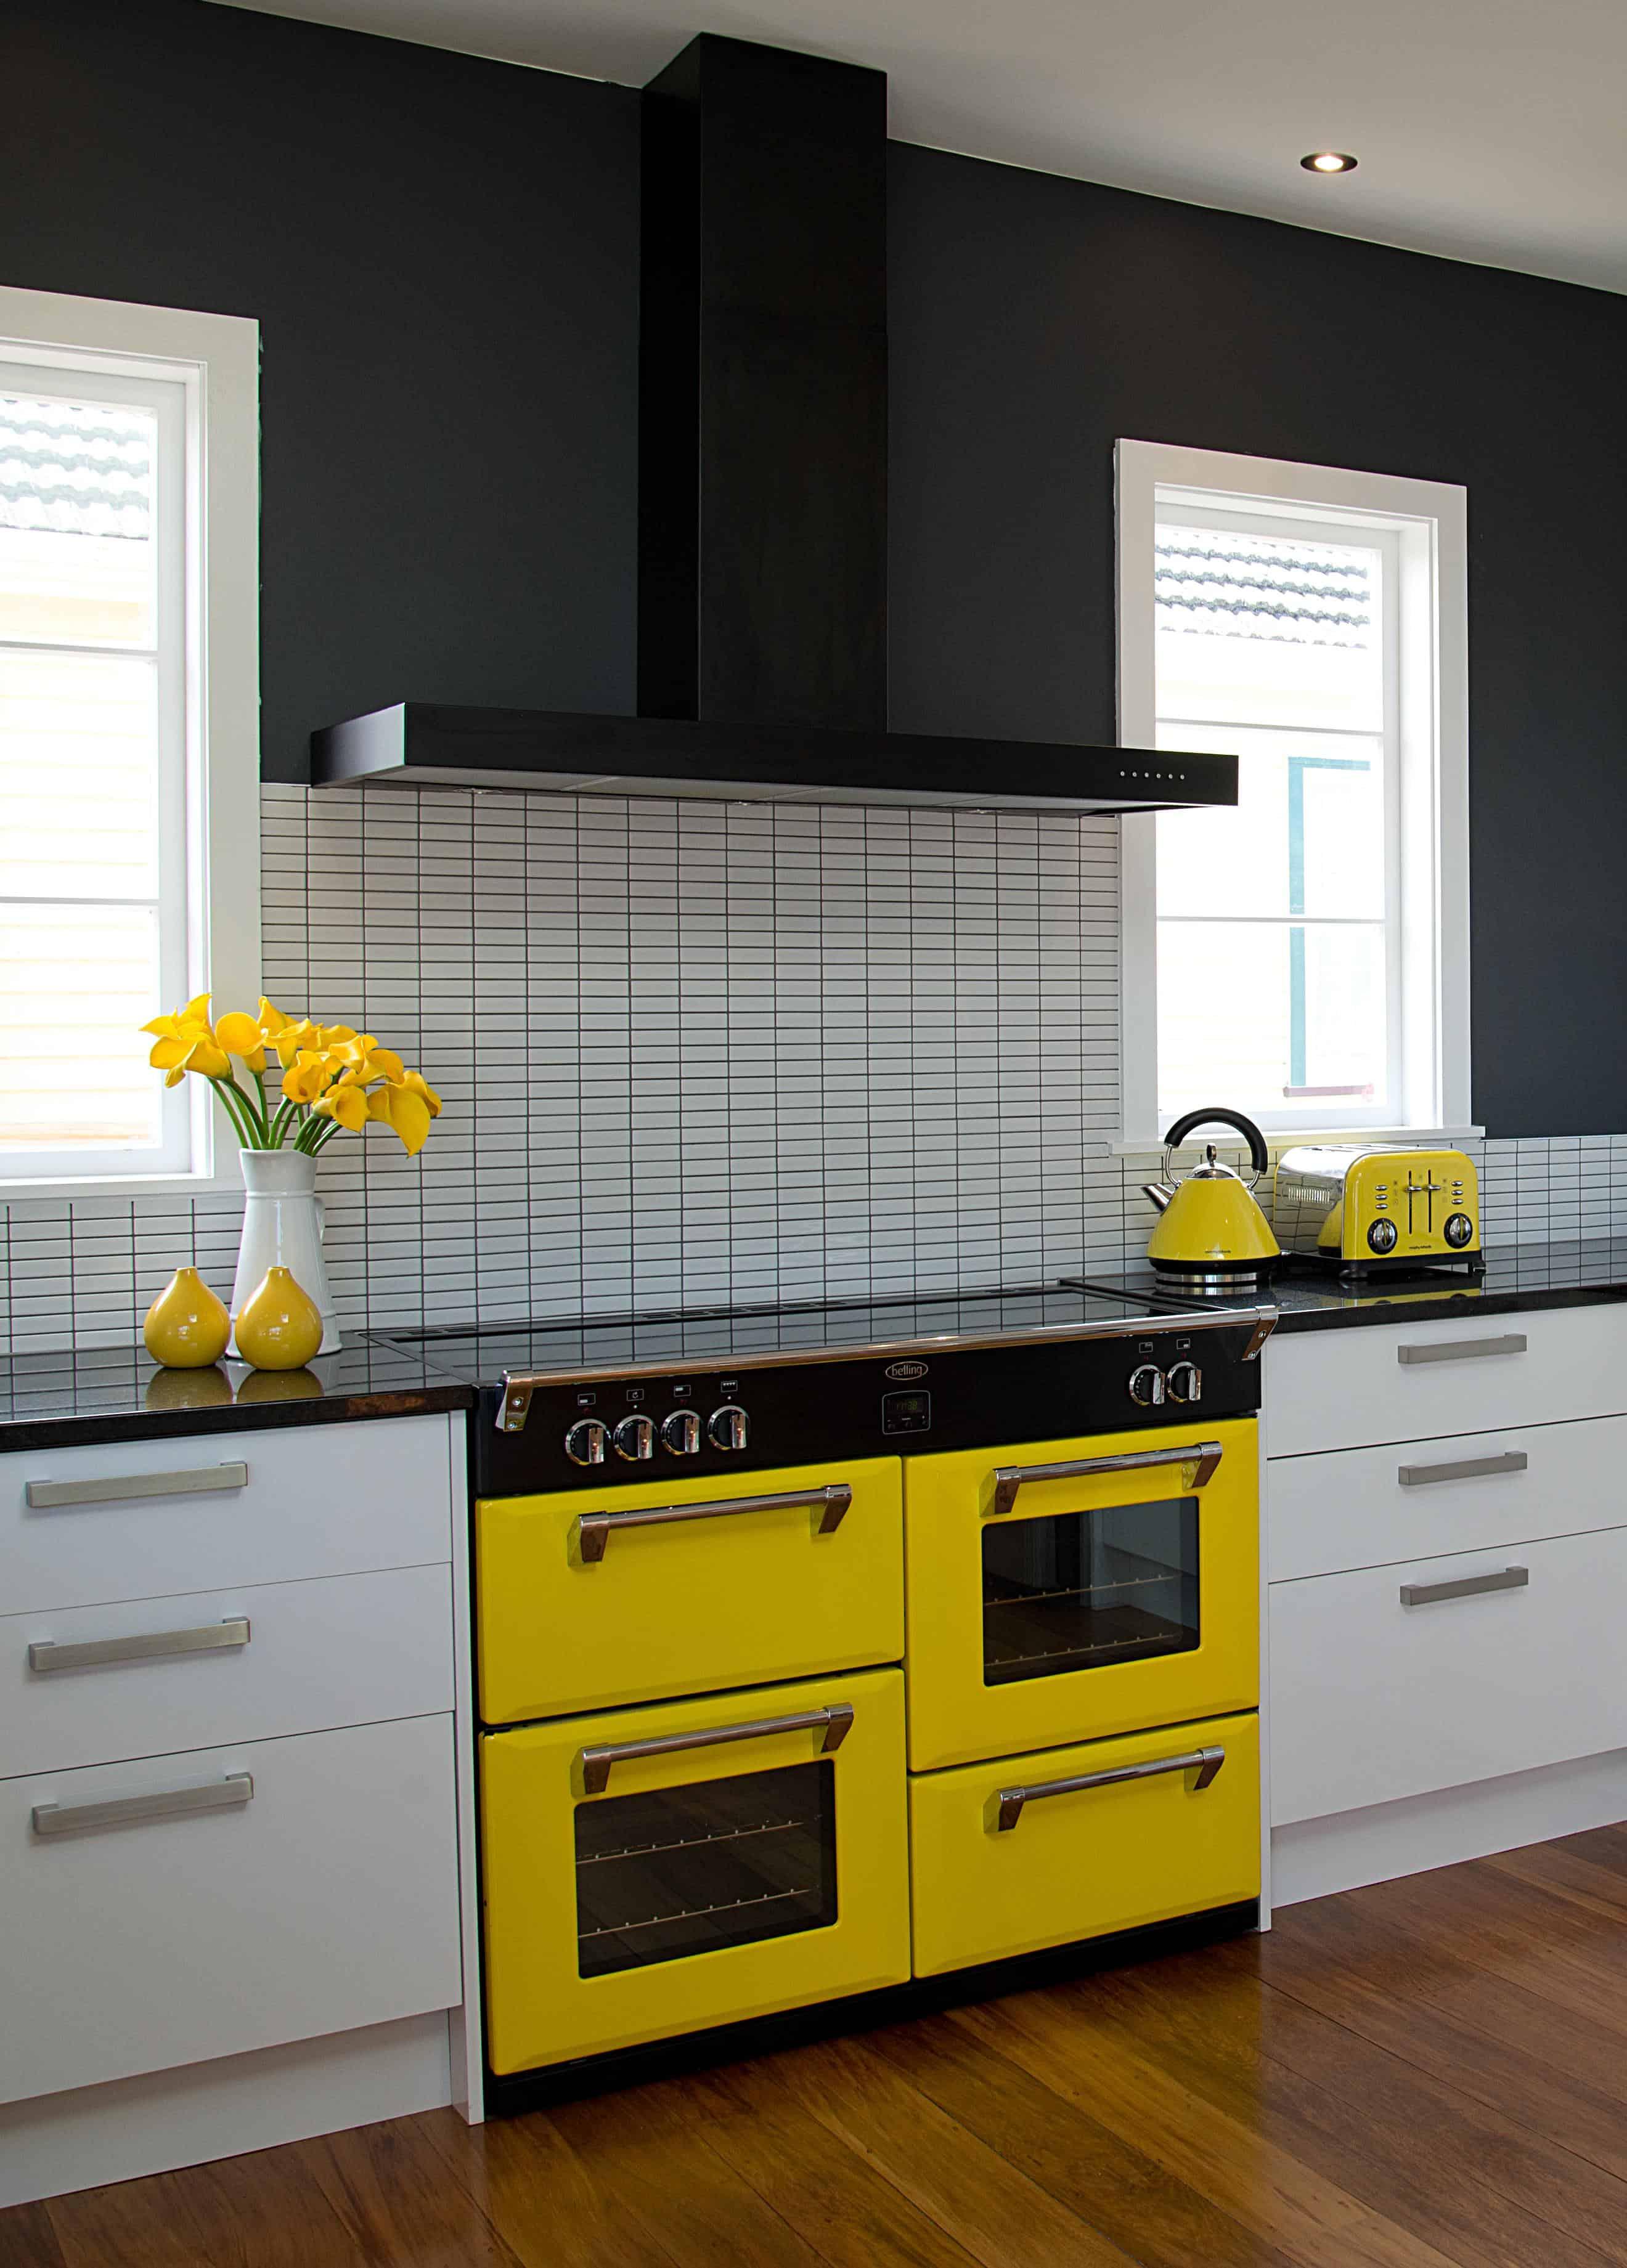 11 Yellow kitchen ideas that will brighten your home